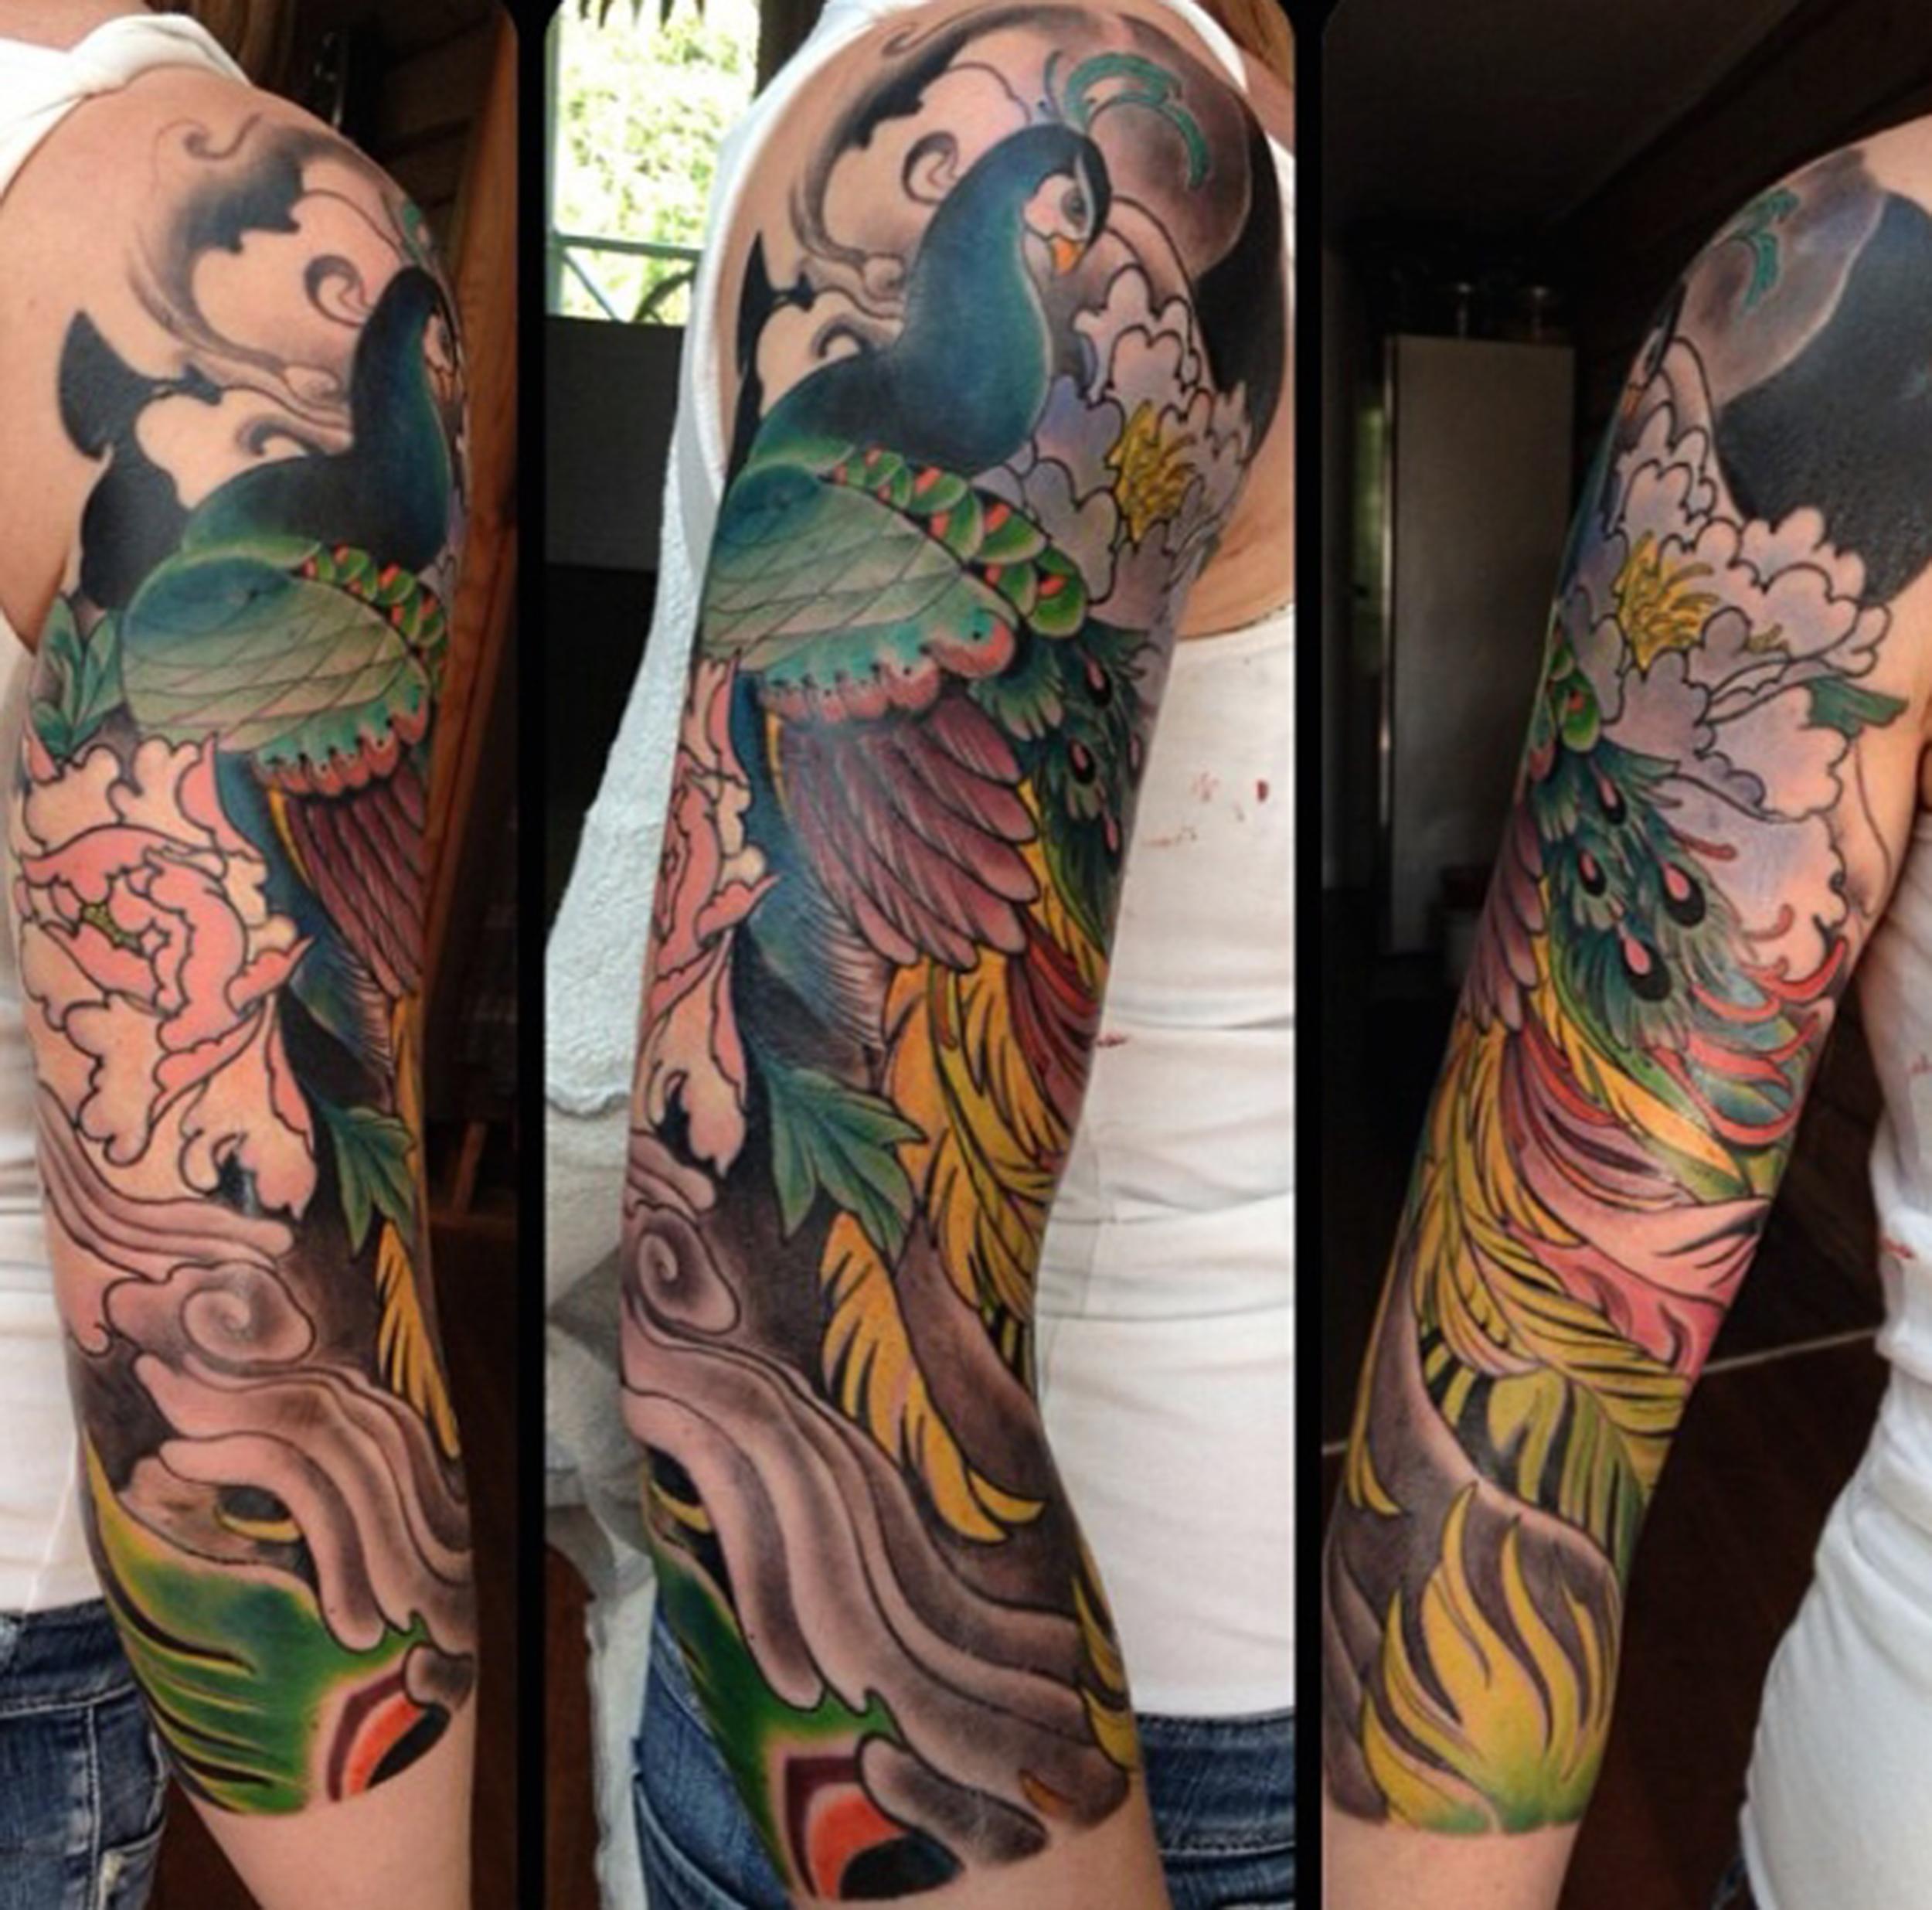 sleeve-asian-flower-Tattoo -LA-LosAngeles-besttattoo-besttattooartist-besttattooartists-top-pictures-images-photo-tat-ink-inked-bigboy-guestartist-rabblerousertattoo